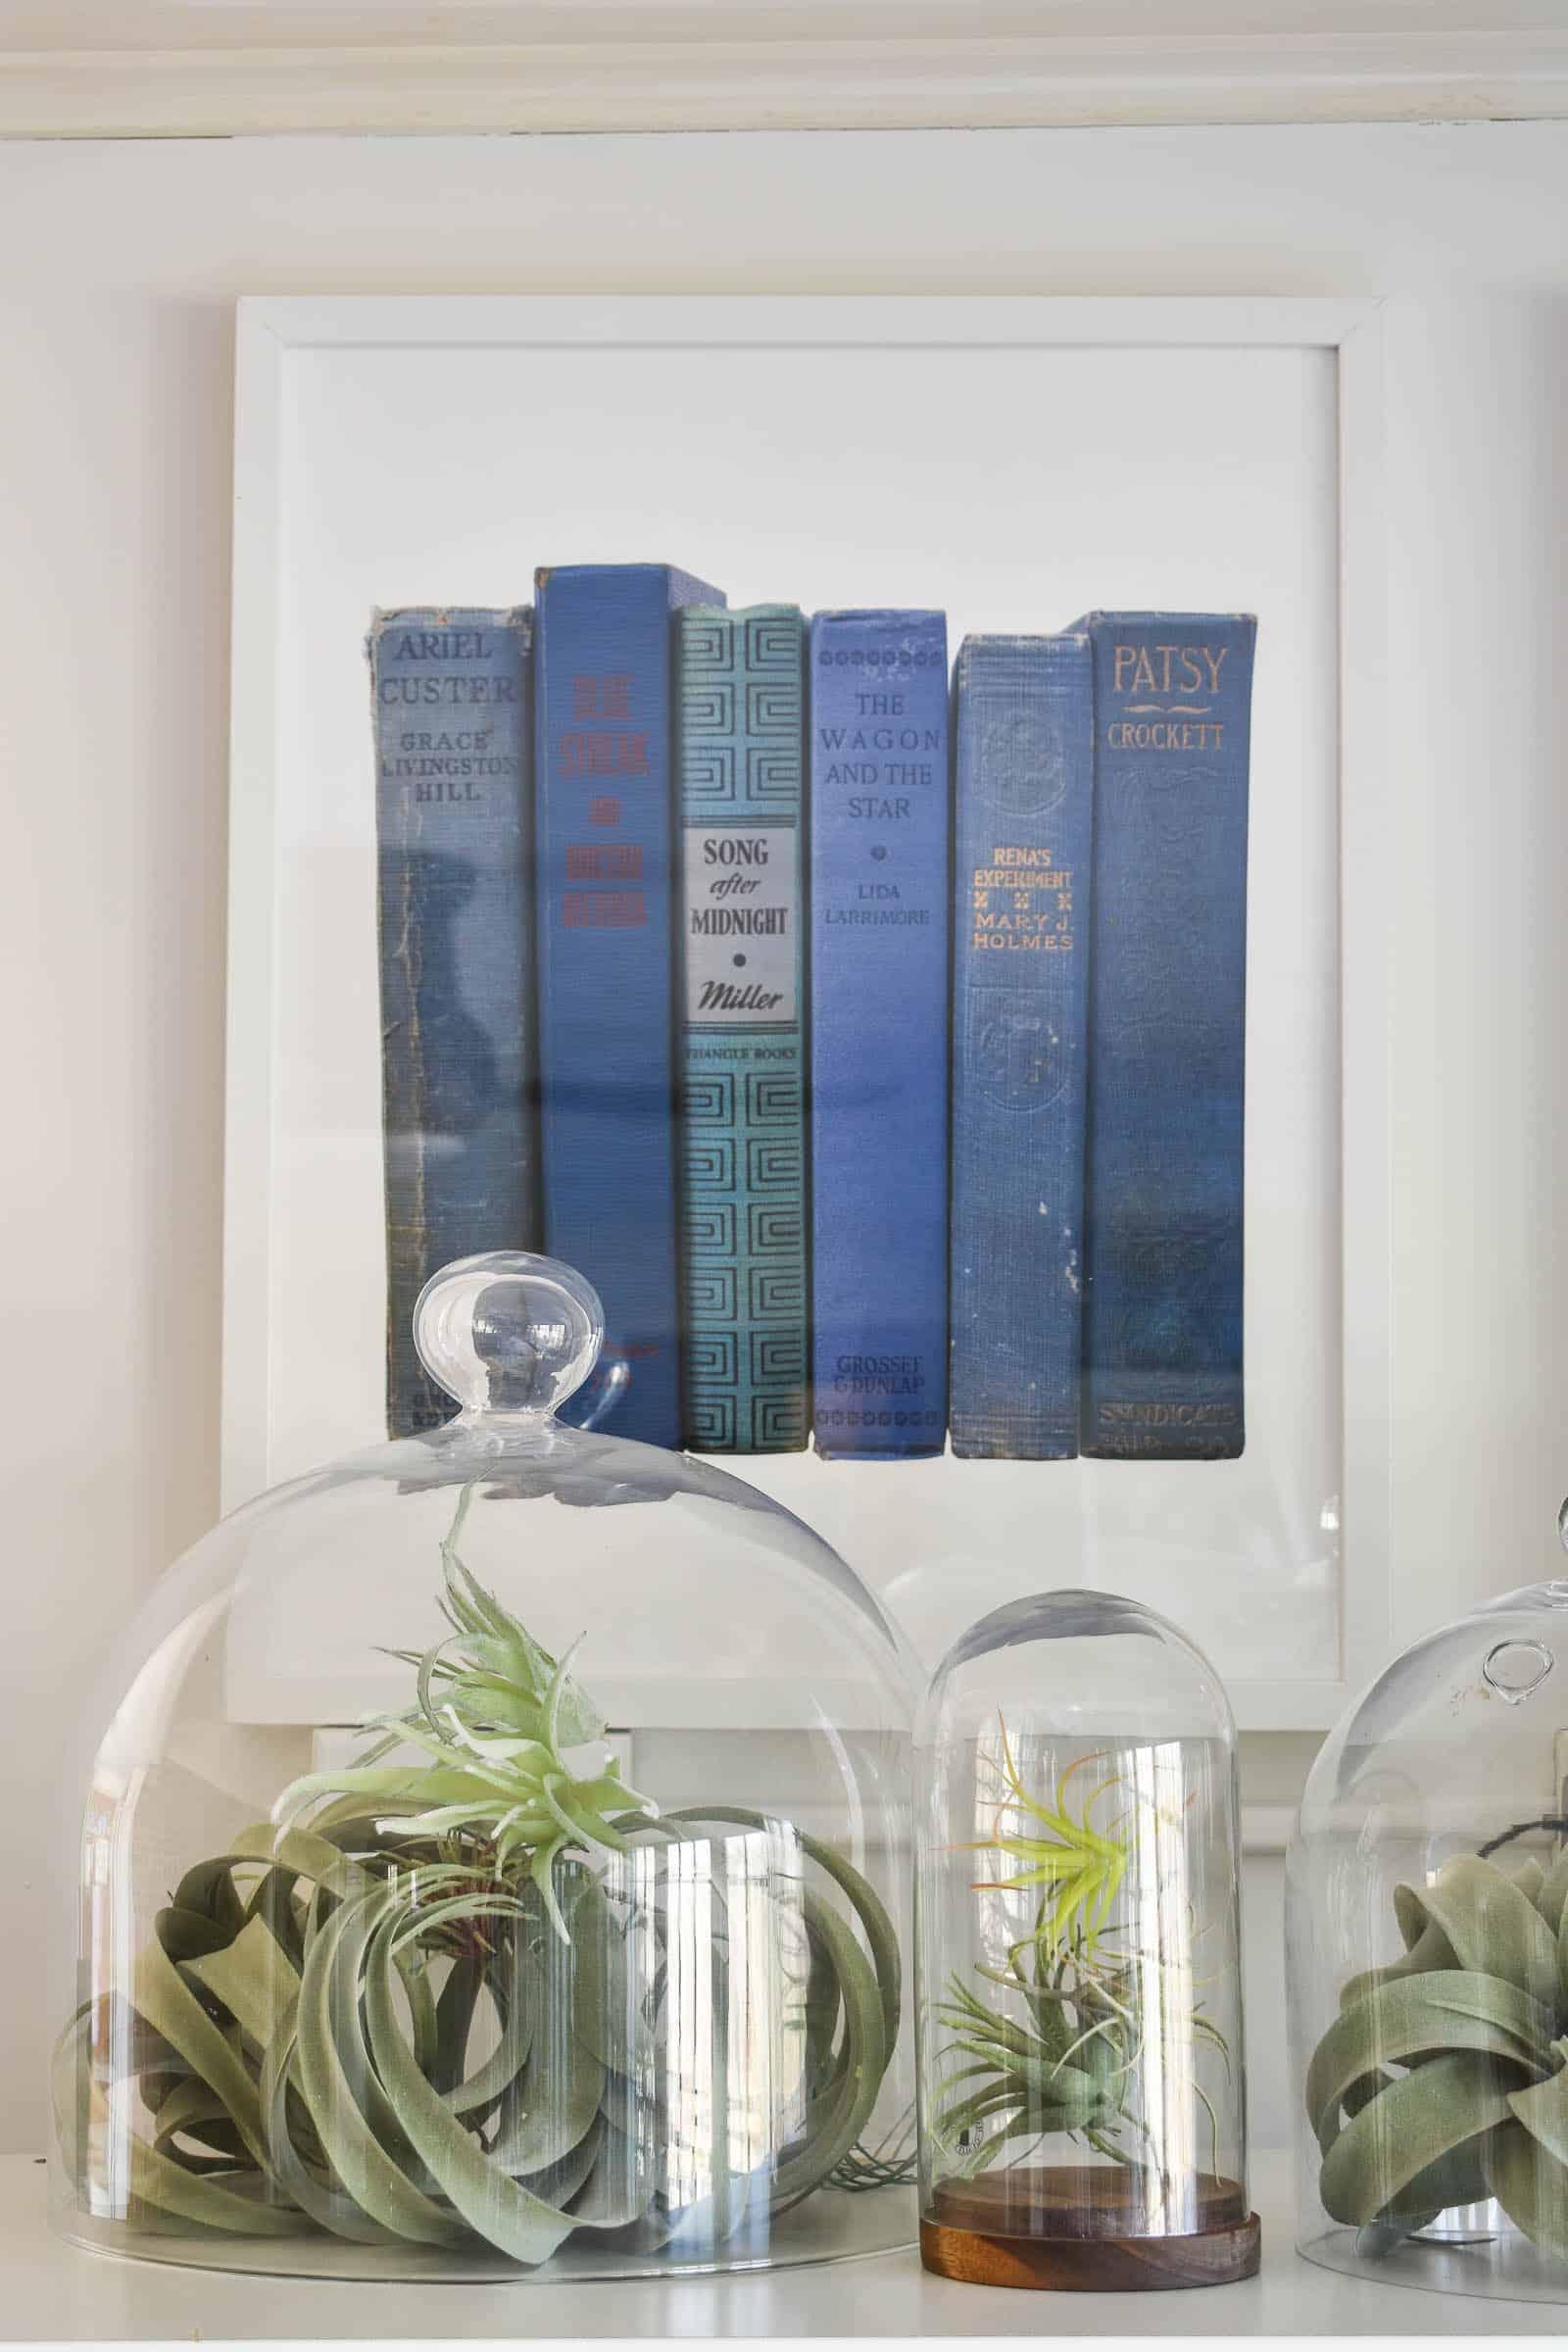 minted prints above storage shelf